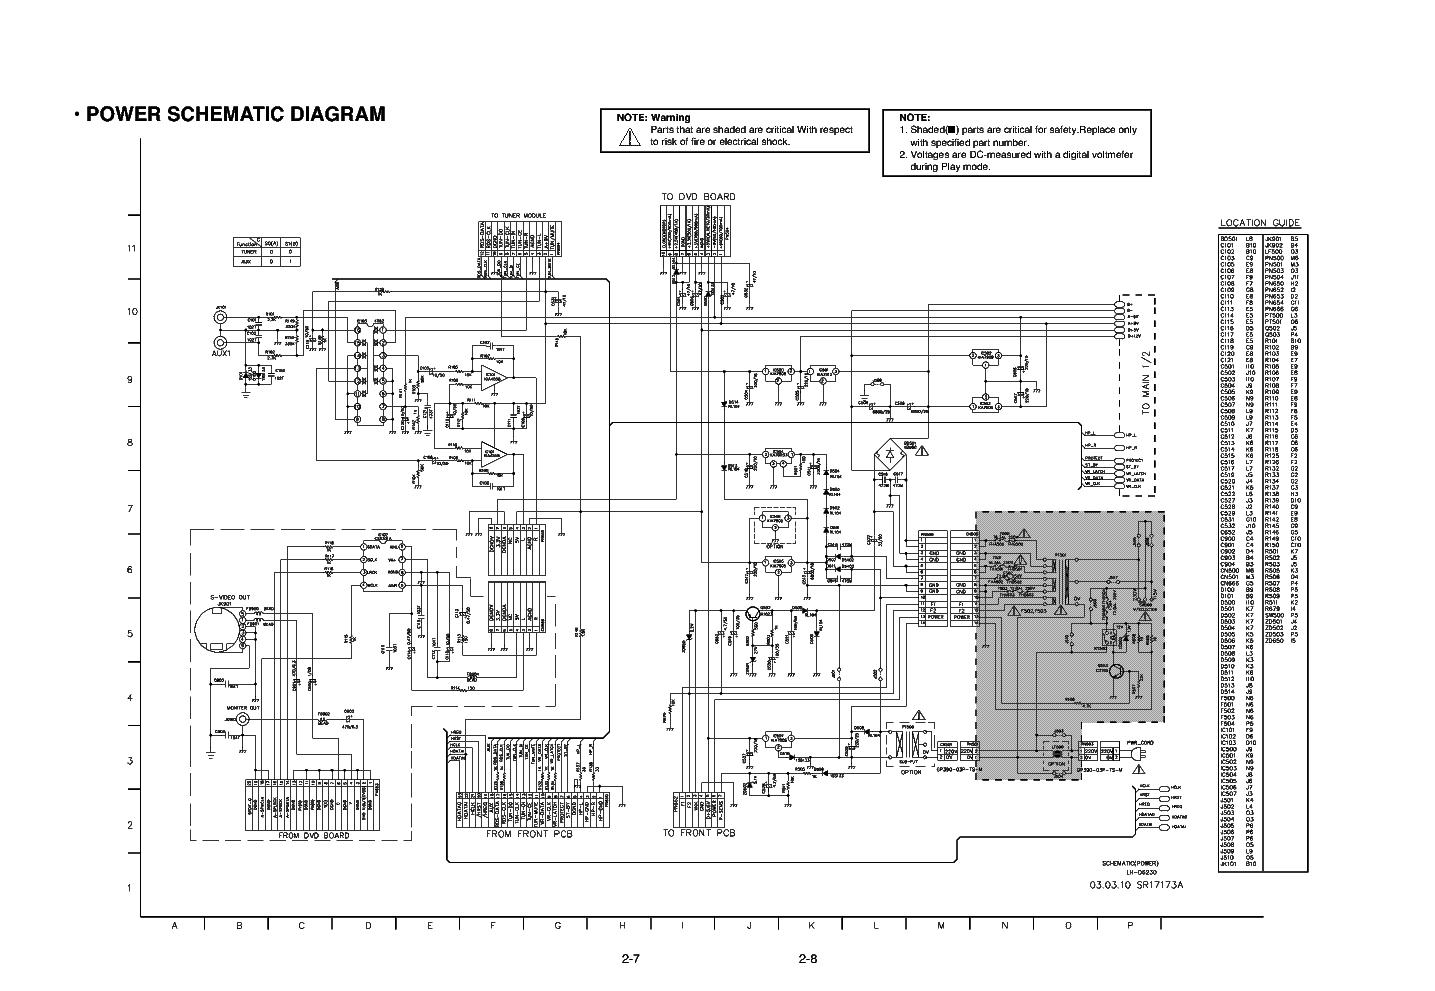 Lg Usp490m 42lp Pdp42v6 Plasma Tv Power Supply Schematic